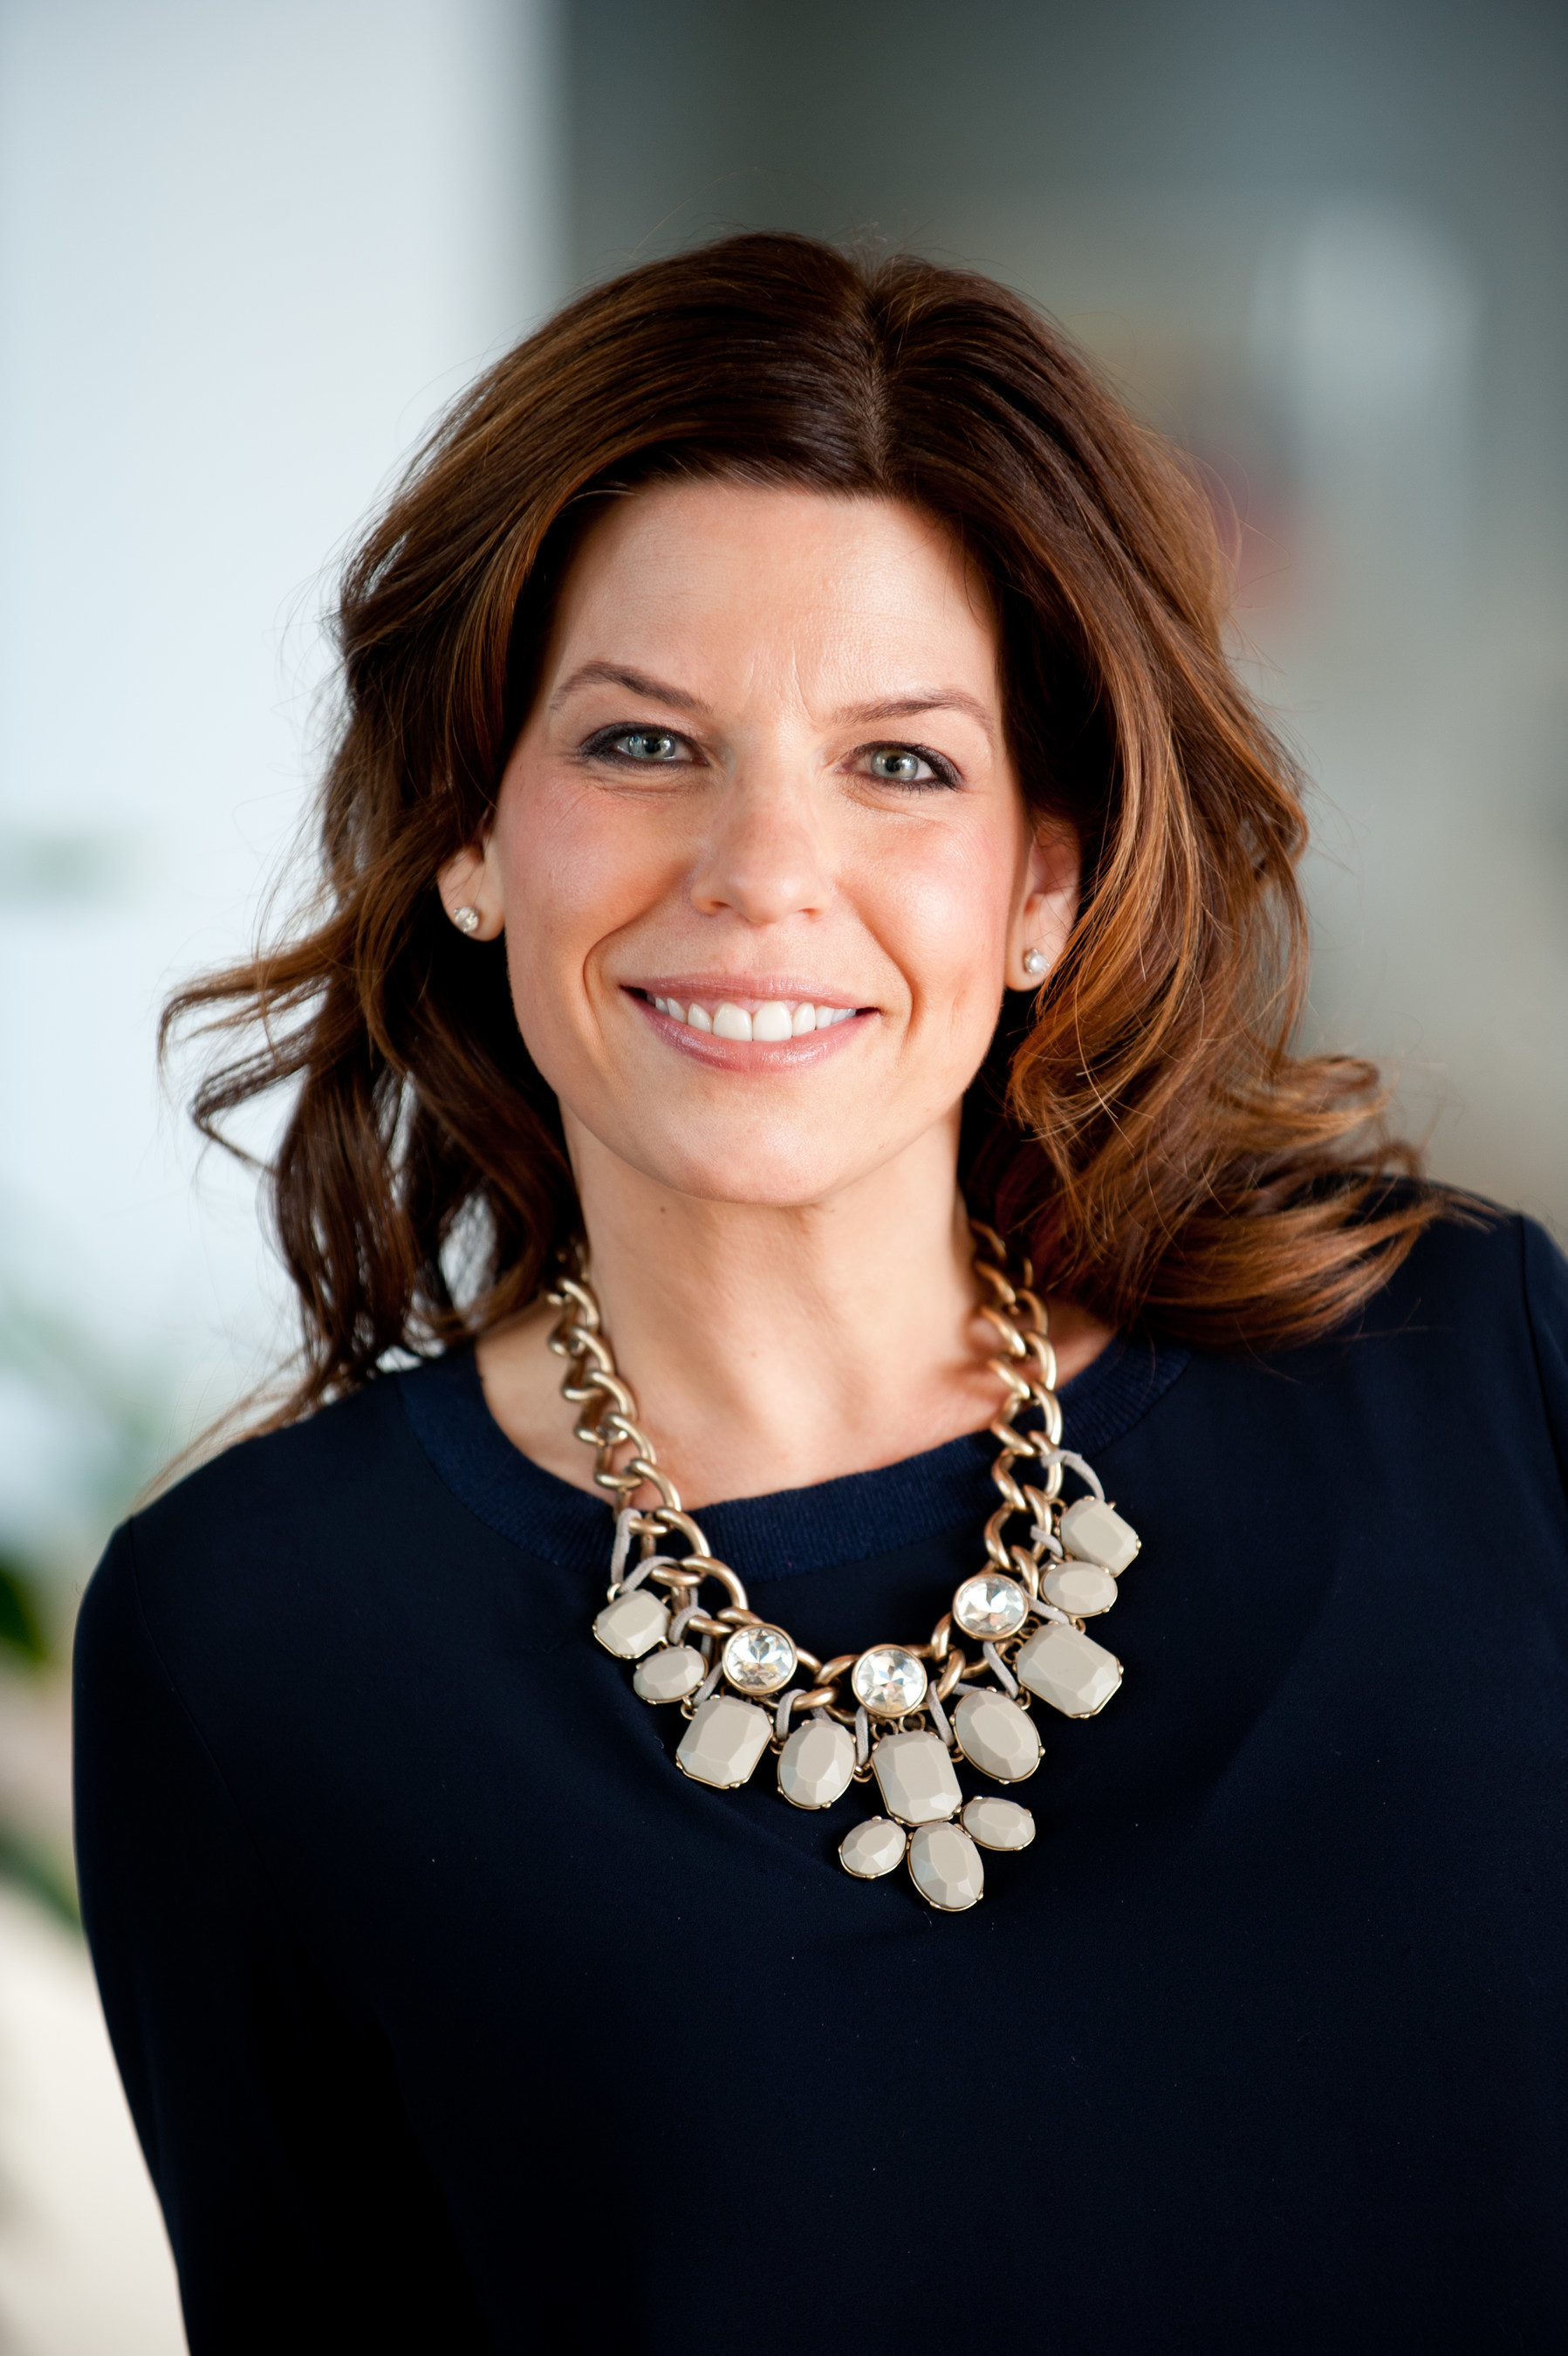 Debbie Myszynski will lead a portfolio of brands at Chicago-based digital agency Frequency540.